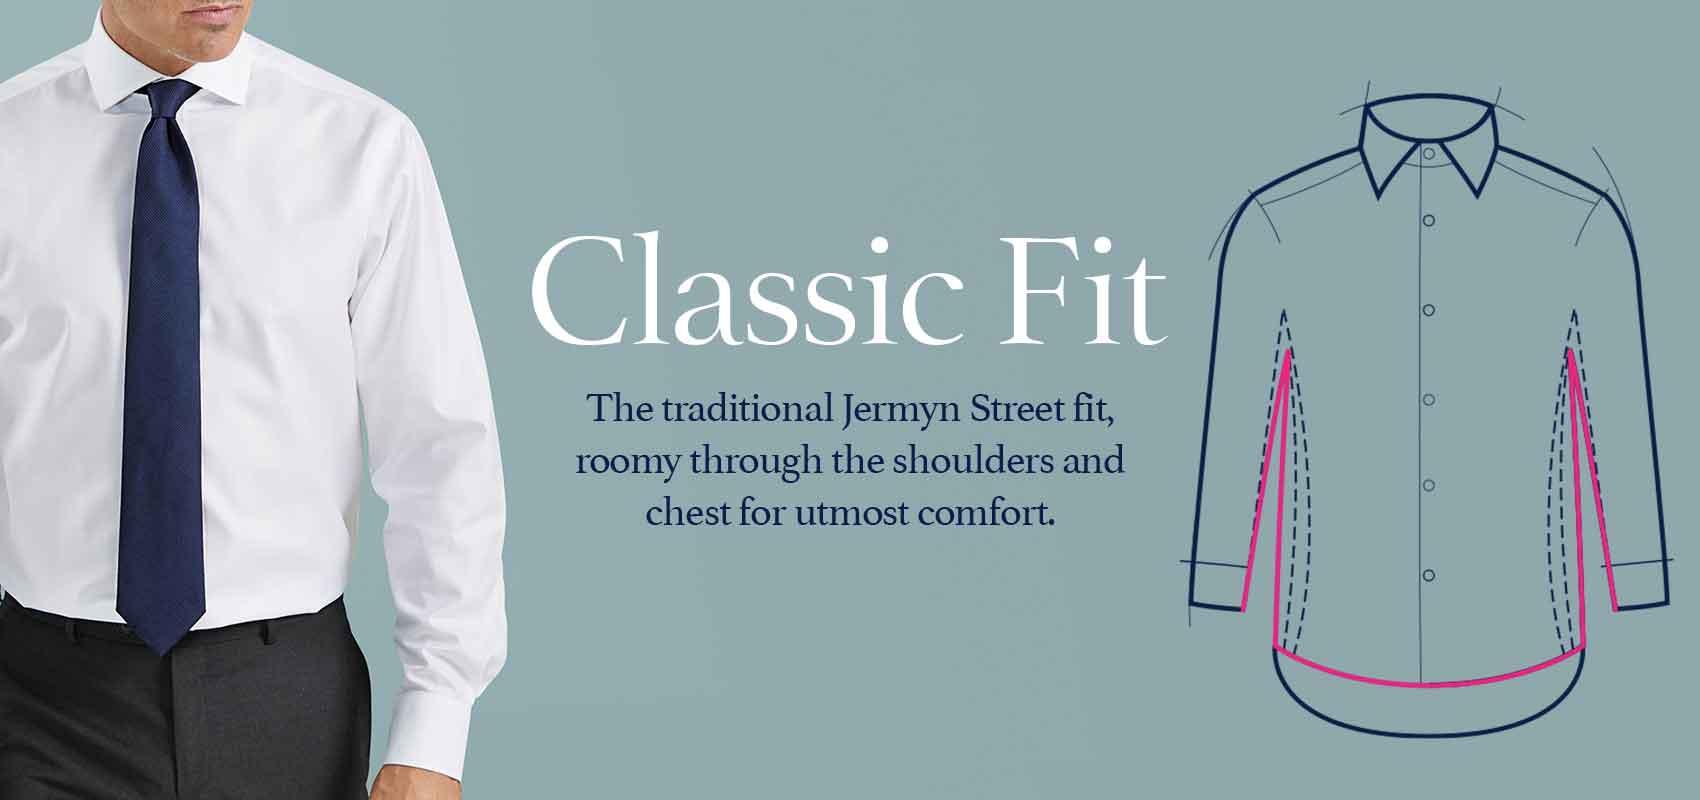 Charles Tyrwhitt classic fit shirts